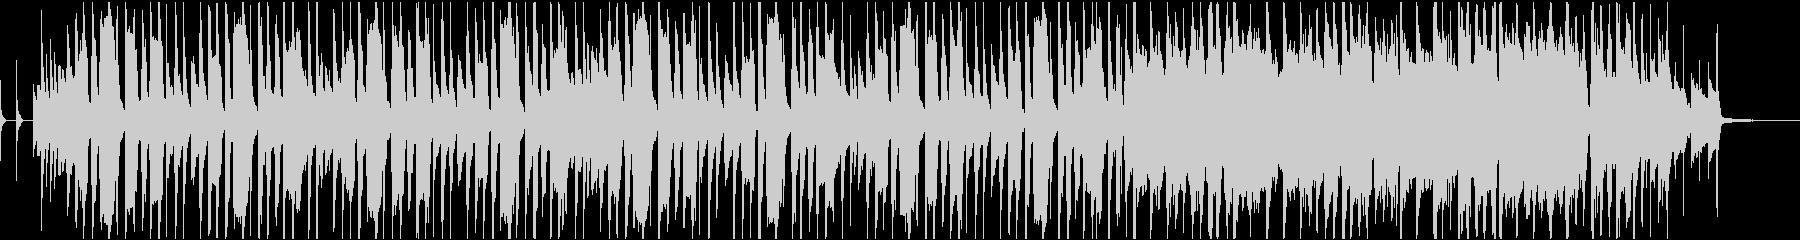 CMや映像用の楽しいトランペットの曲の未再生の波形